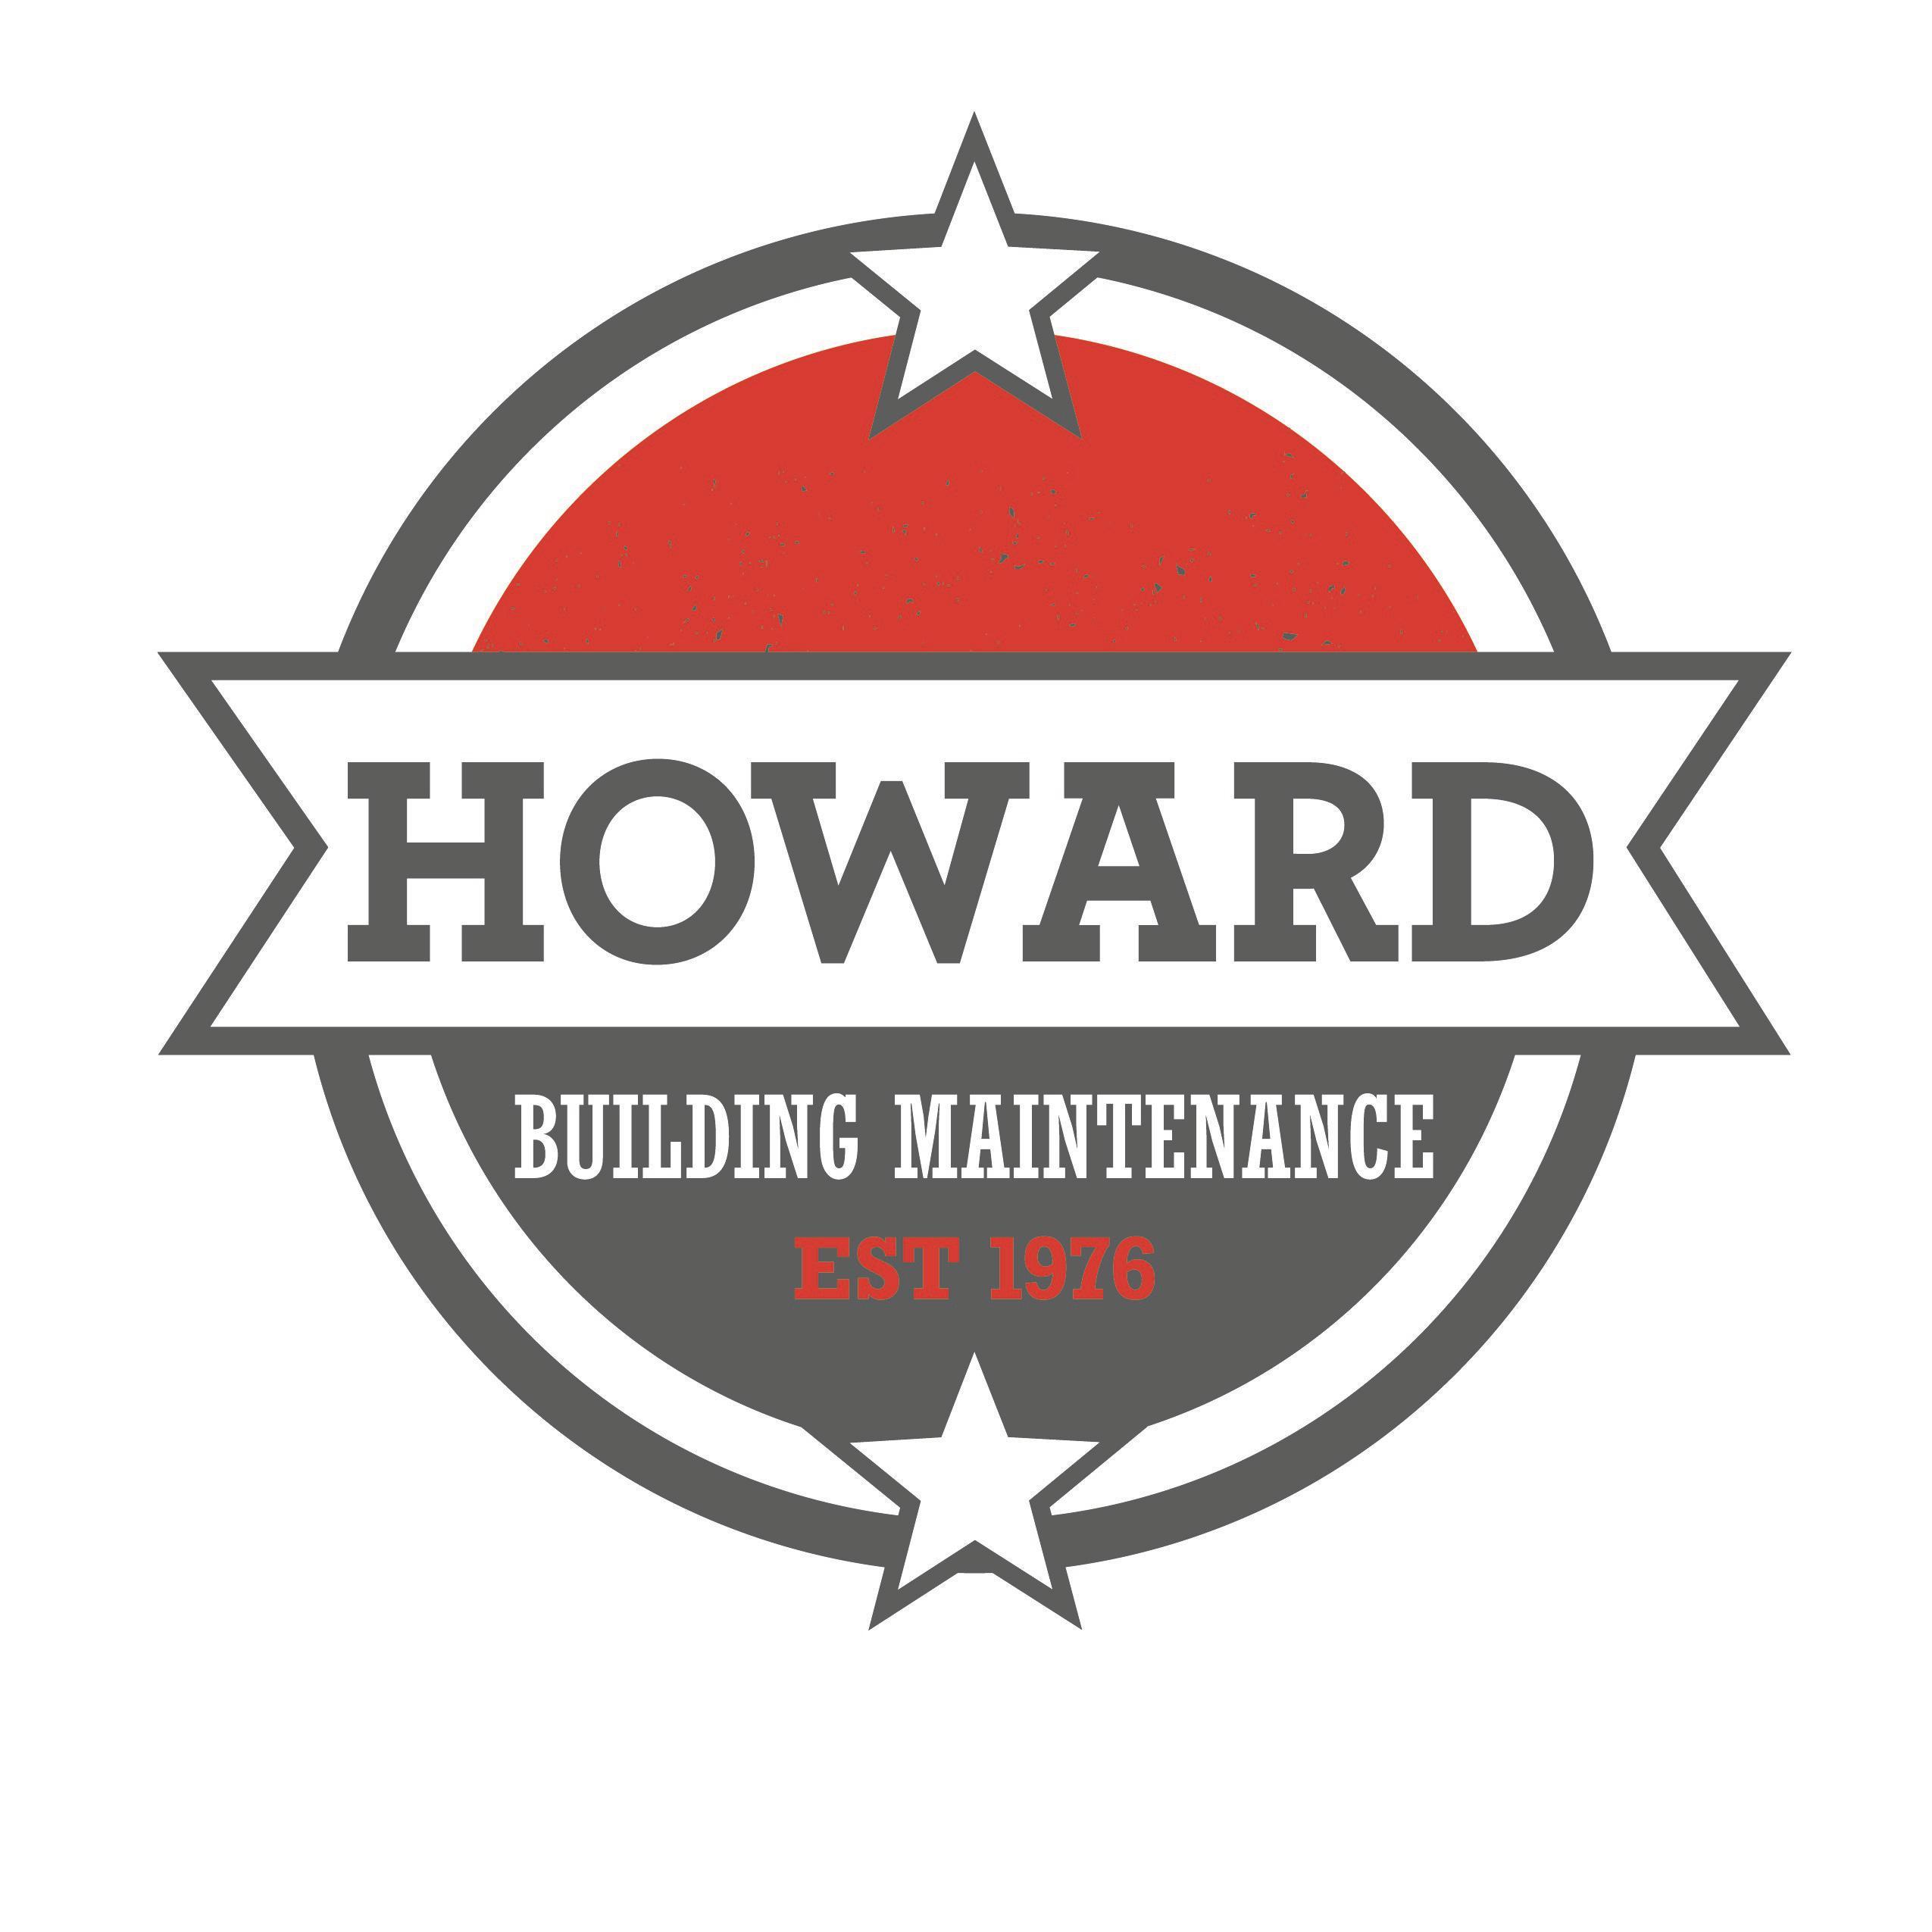 Howard Building Maintenance